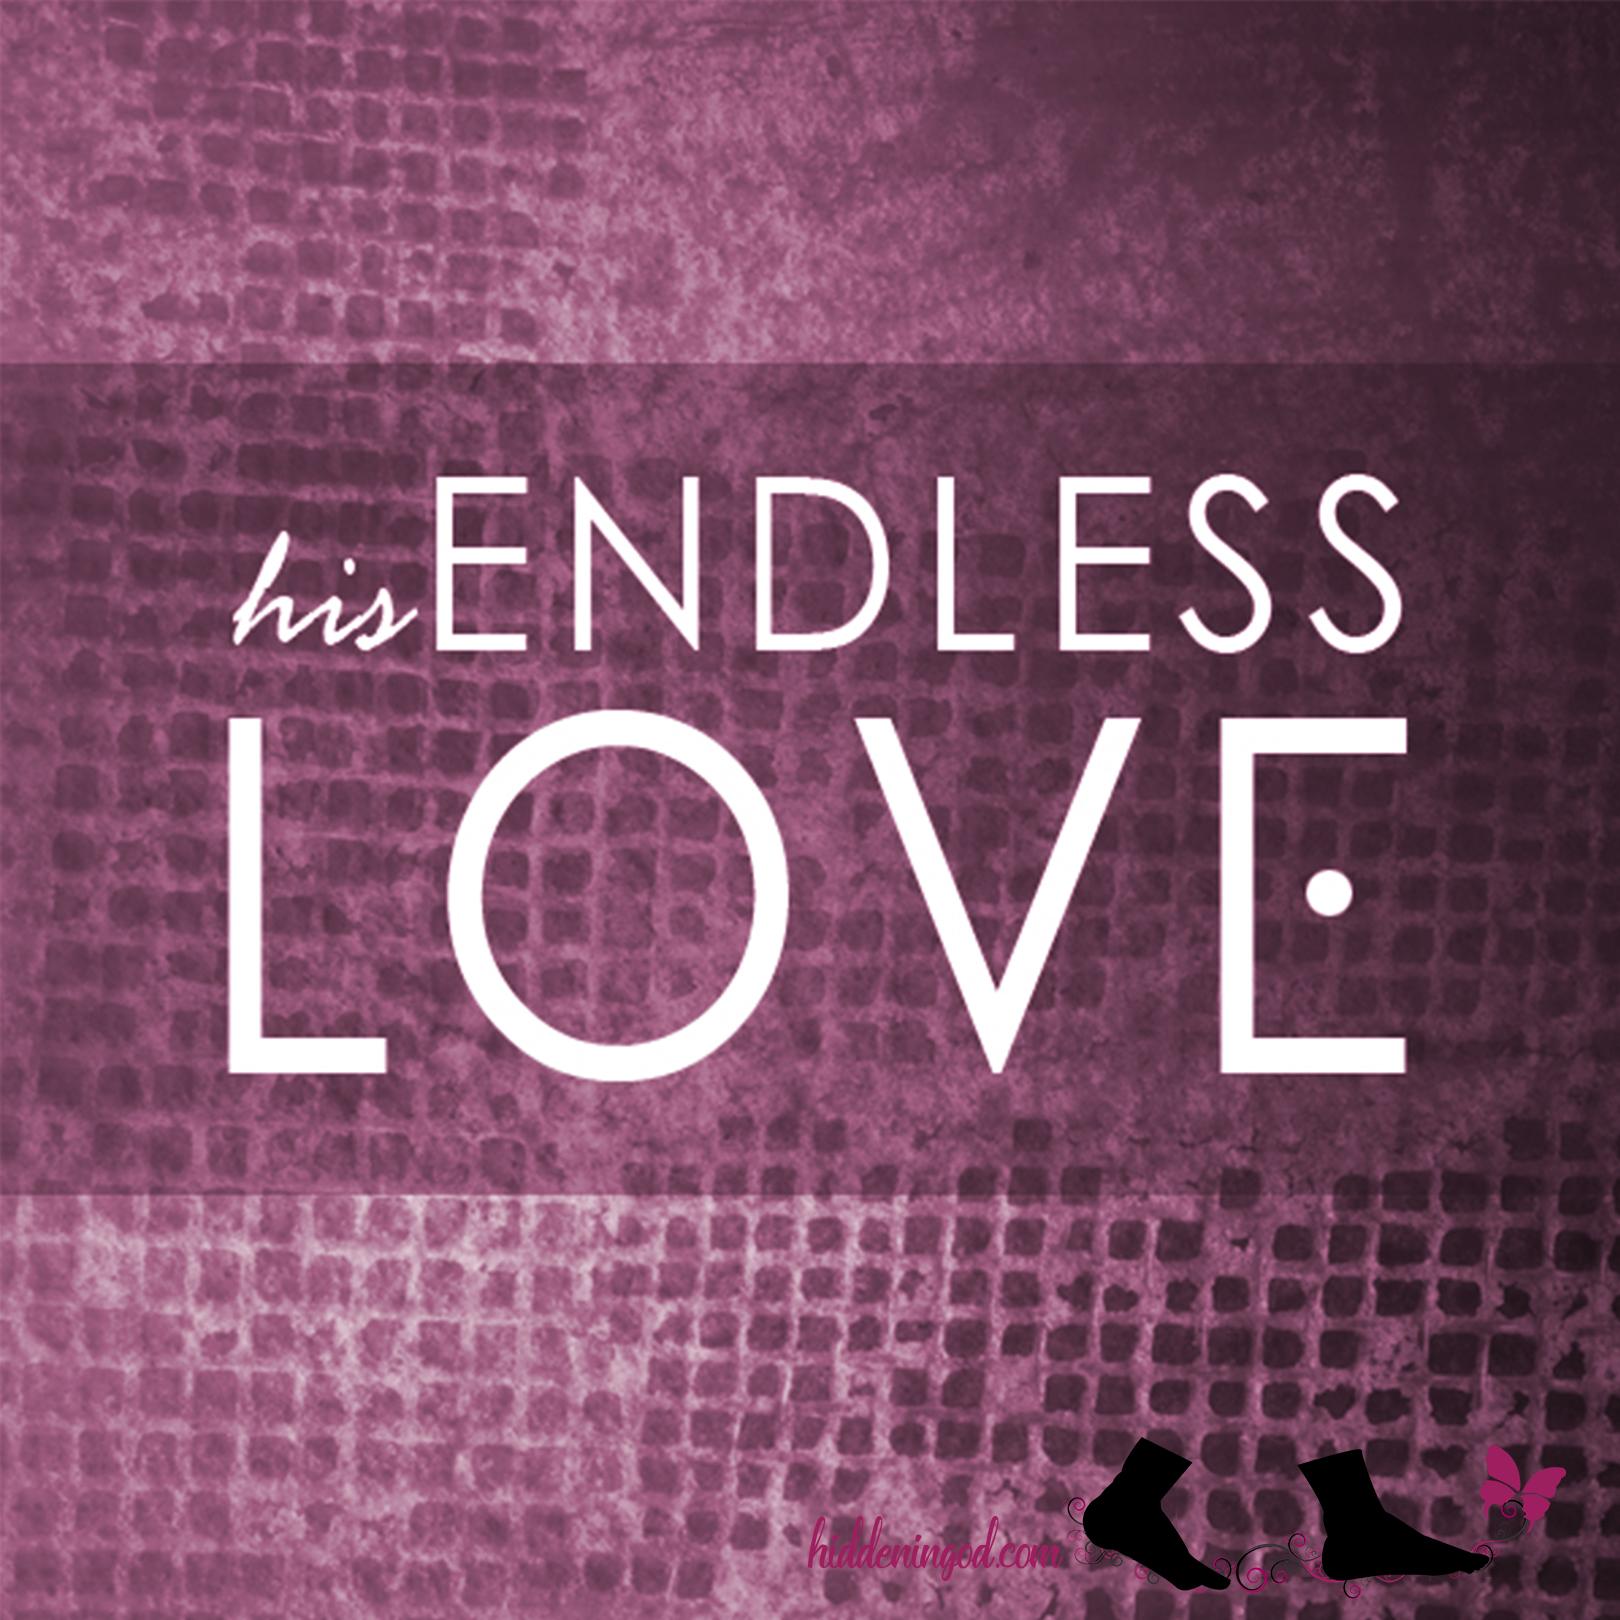 An Endless Love